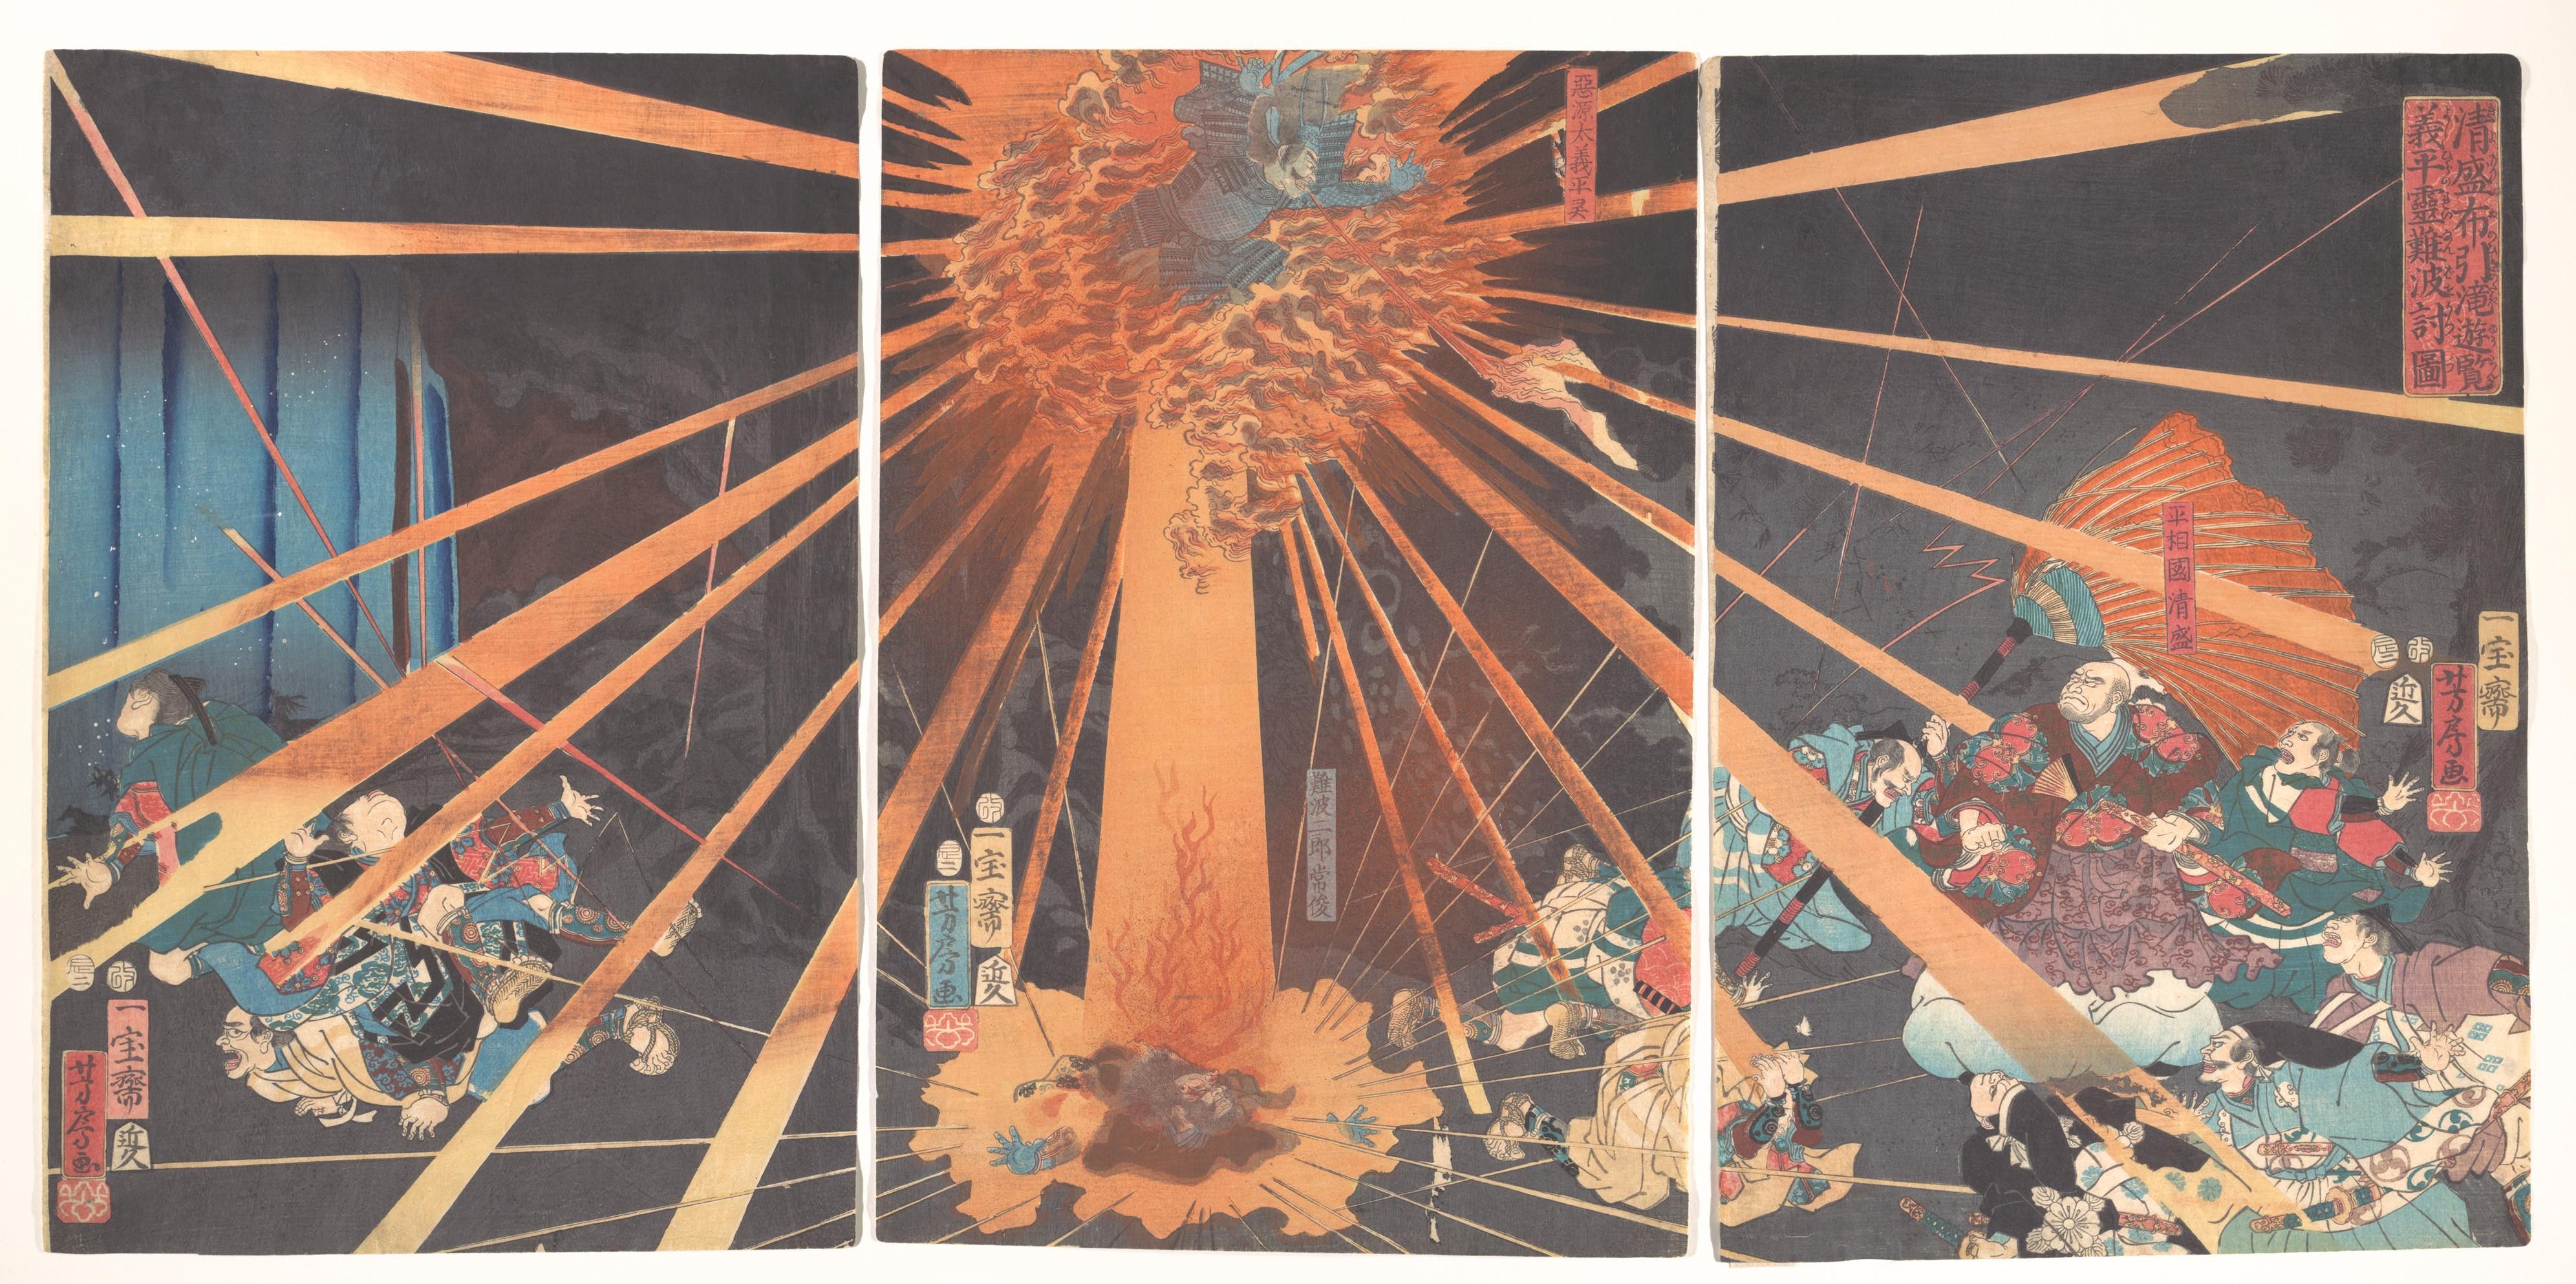 The Ghost of Akugenta Taking Revenge on Nanba at the Nunobiki Waterfall, 1856